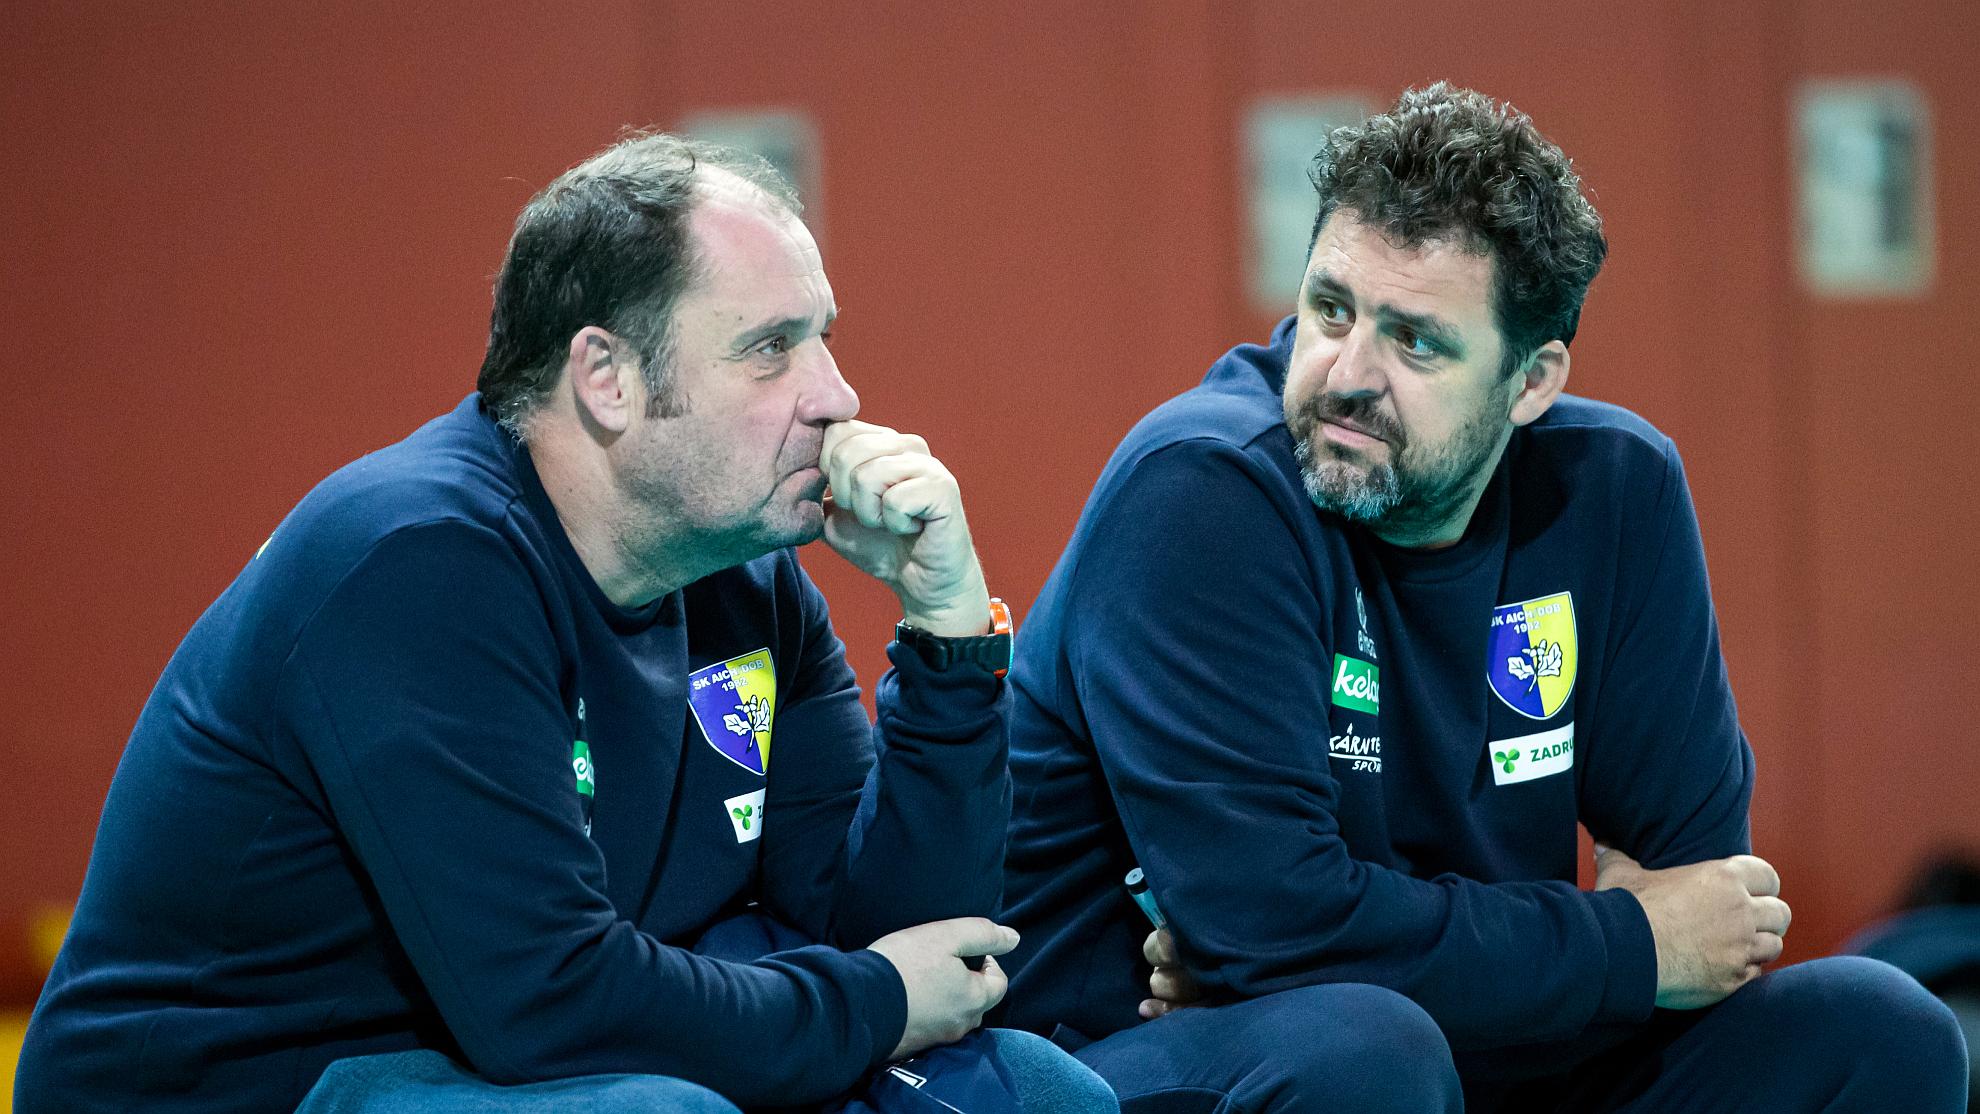 Aich/Dob-Sportdirektor Martin Micheu mit Headcoach Matjaz Hafner - FOTO © GEPA pictures/Wolfgang Jannach